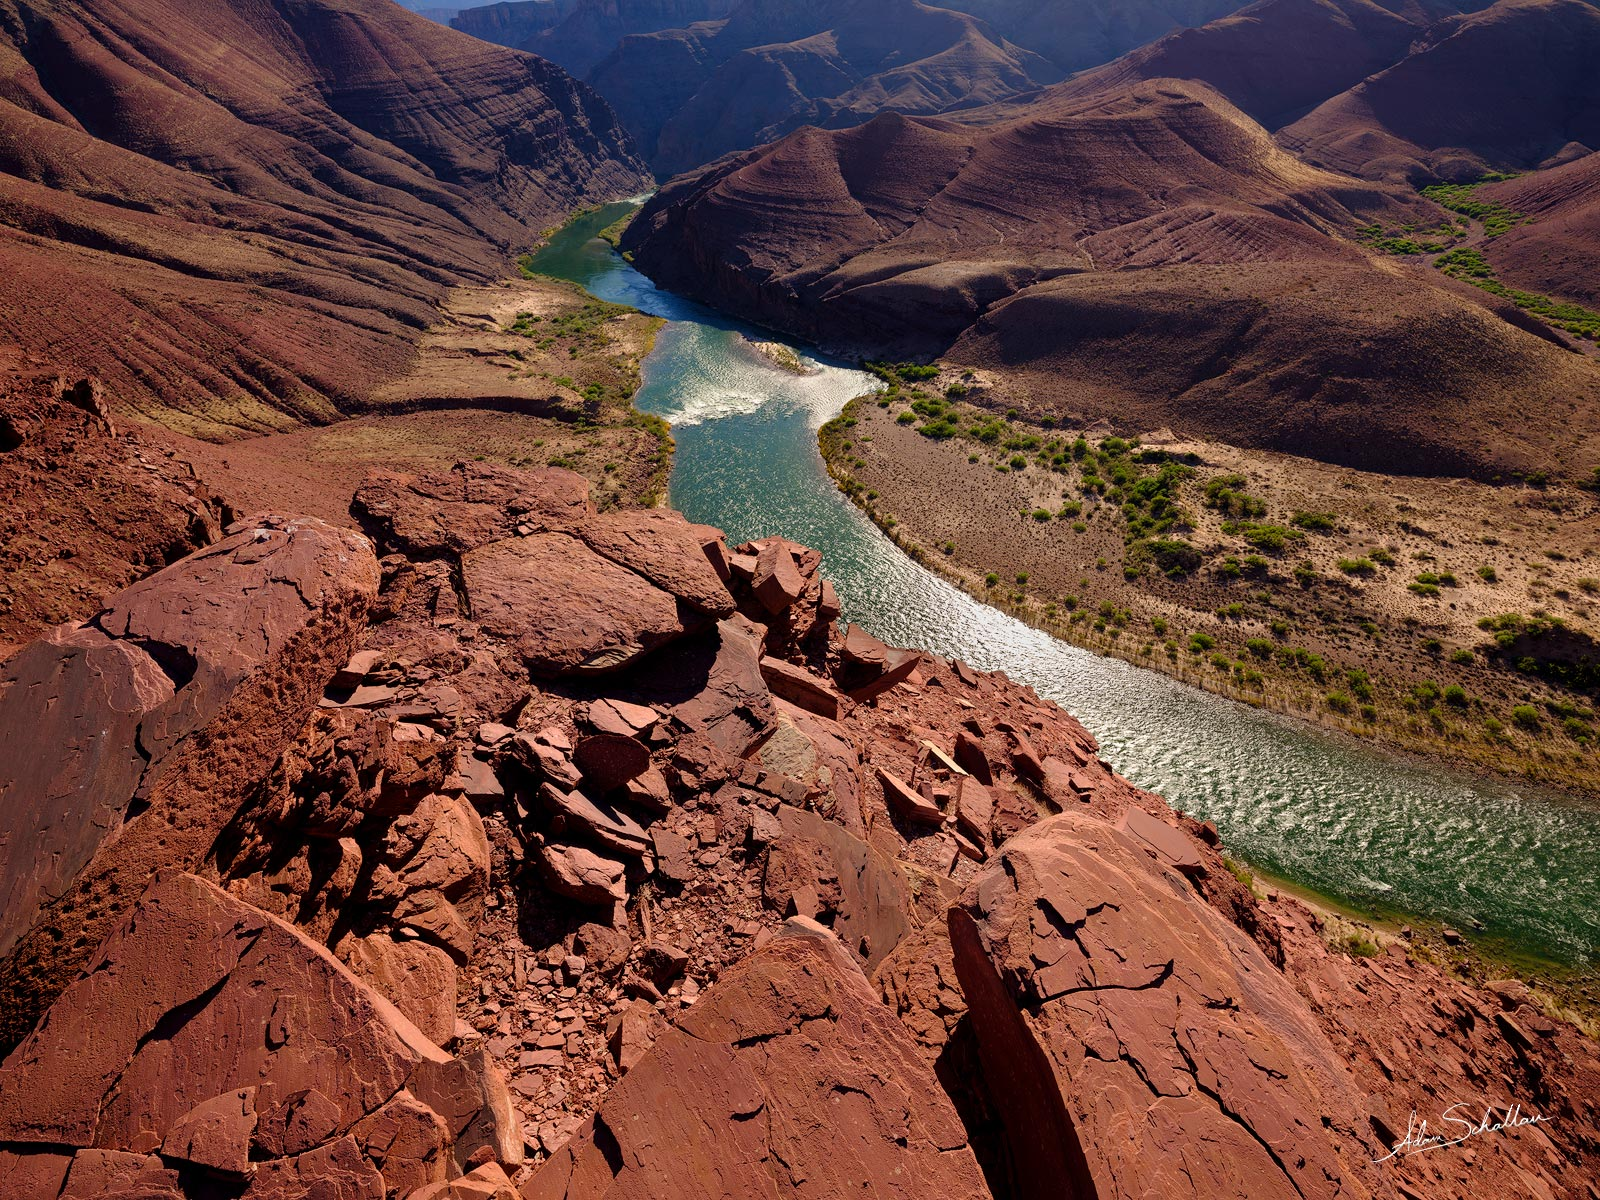 The Colorado River near the Unkar Delta. From the Escalante Route in Grand Canyon National Park.